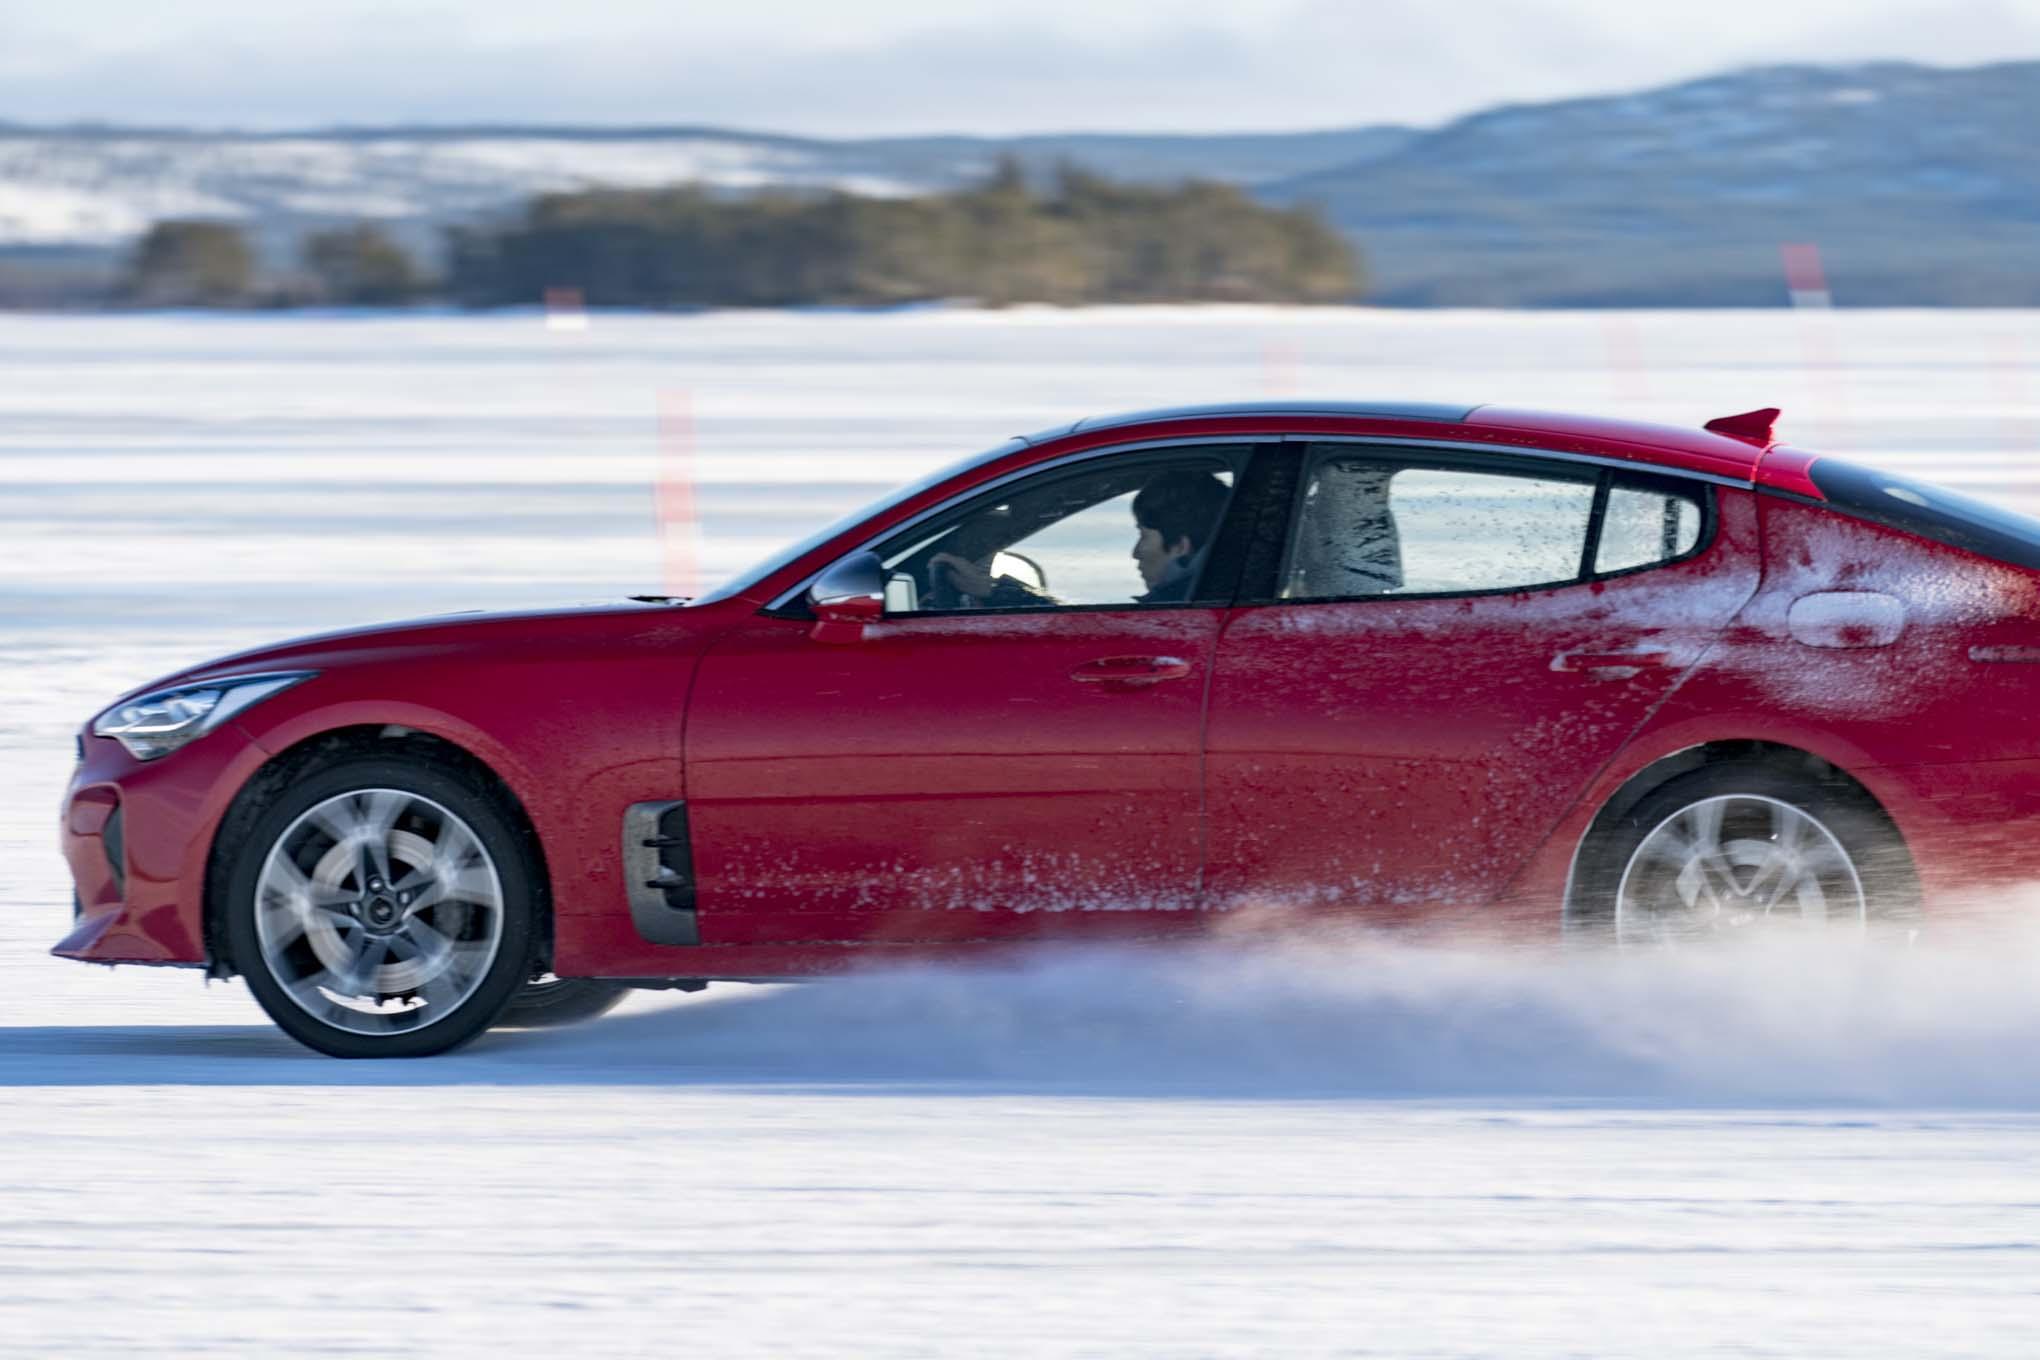 Circuito Kia 2018 : Kia stinger winter drive side in motion motor trend en